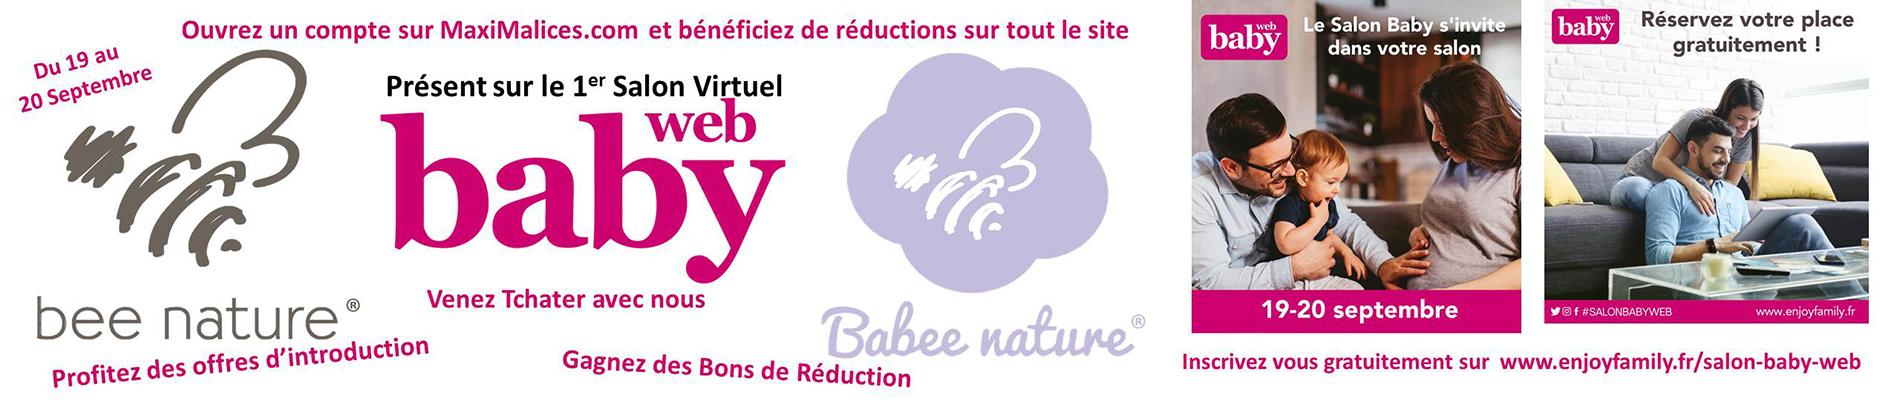 Maximalices - Salon BABY WEB